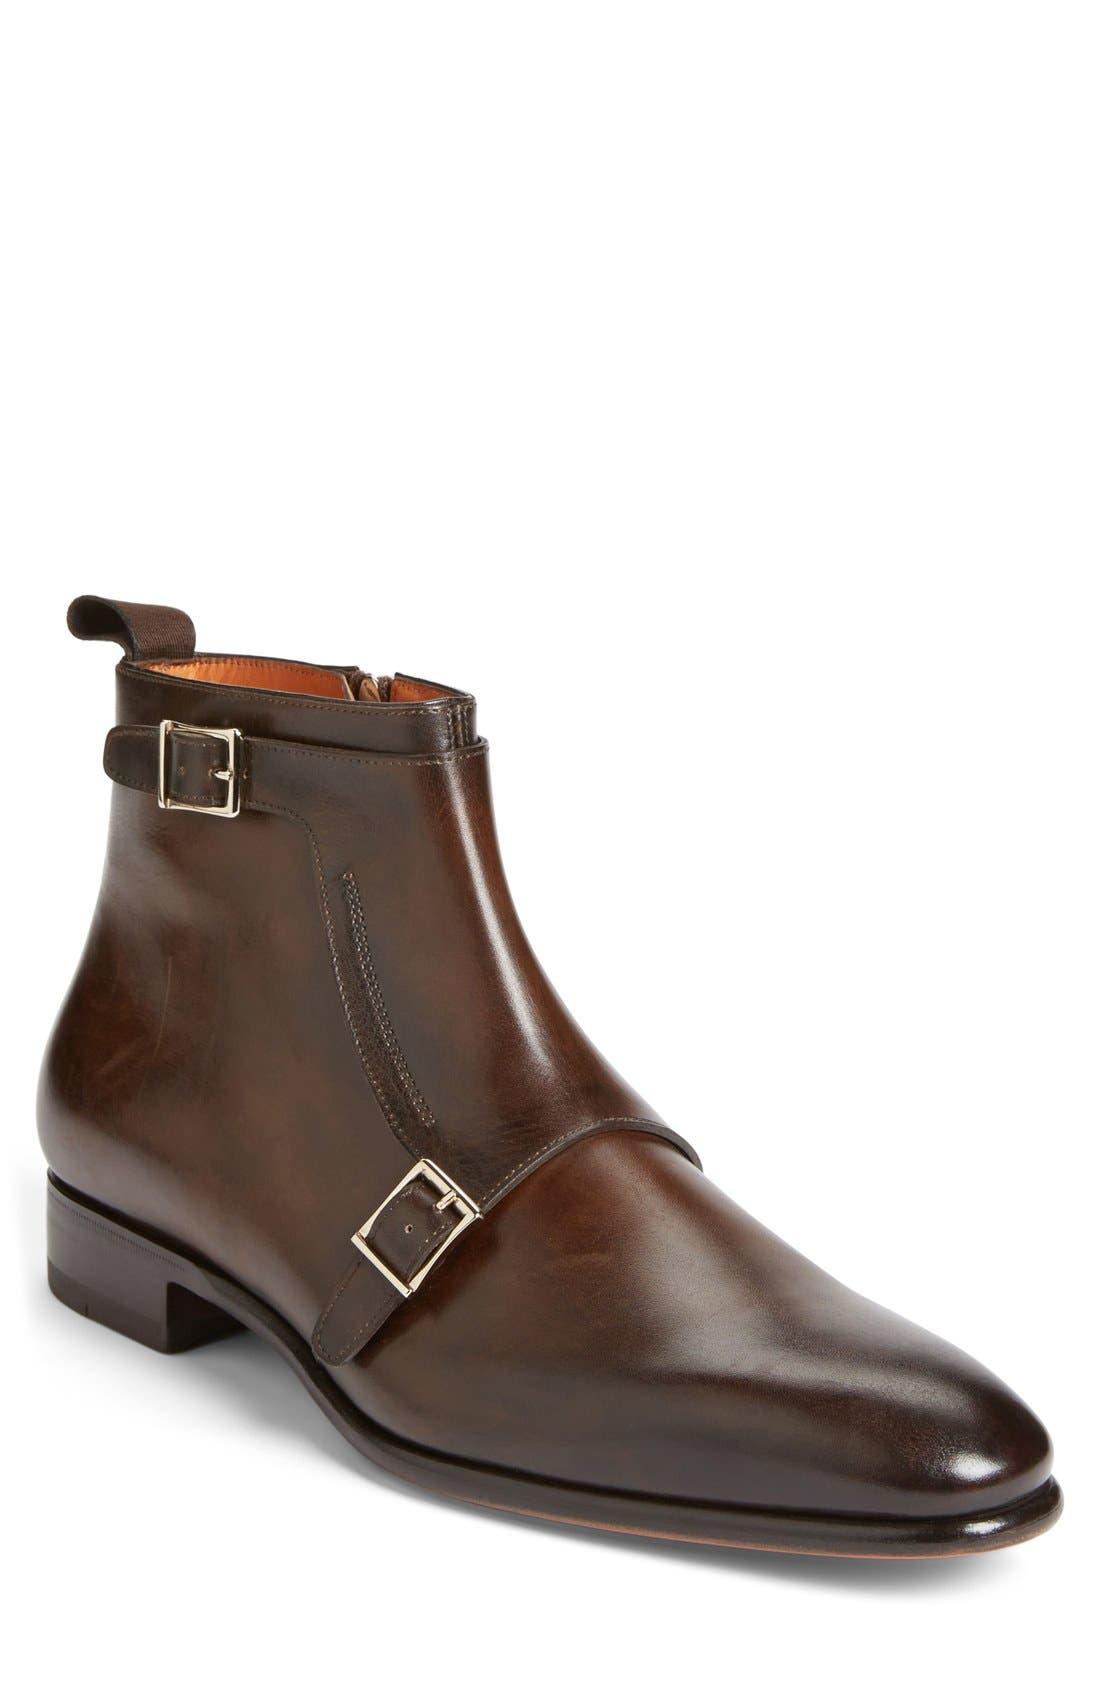 Main Image - Santoni 'Ciro' Double Monk Strap Boot(Men)